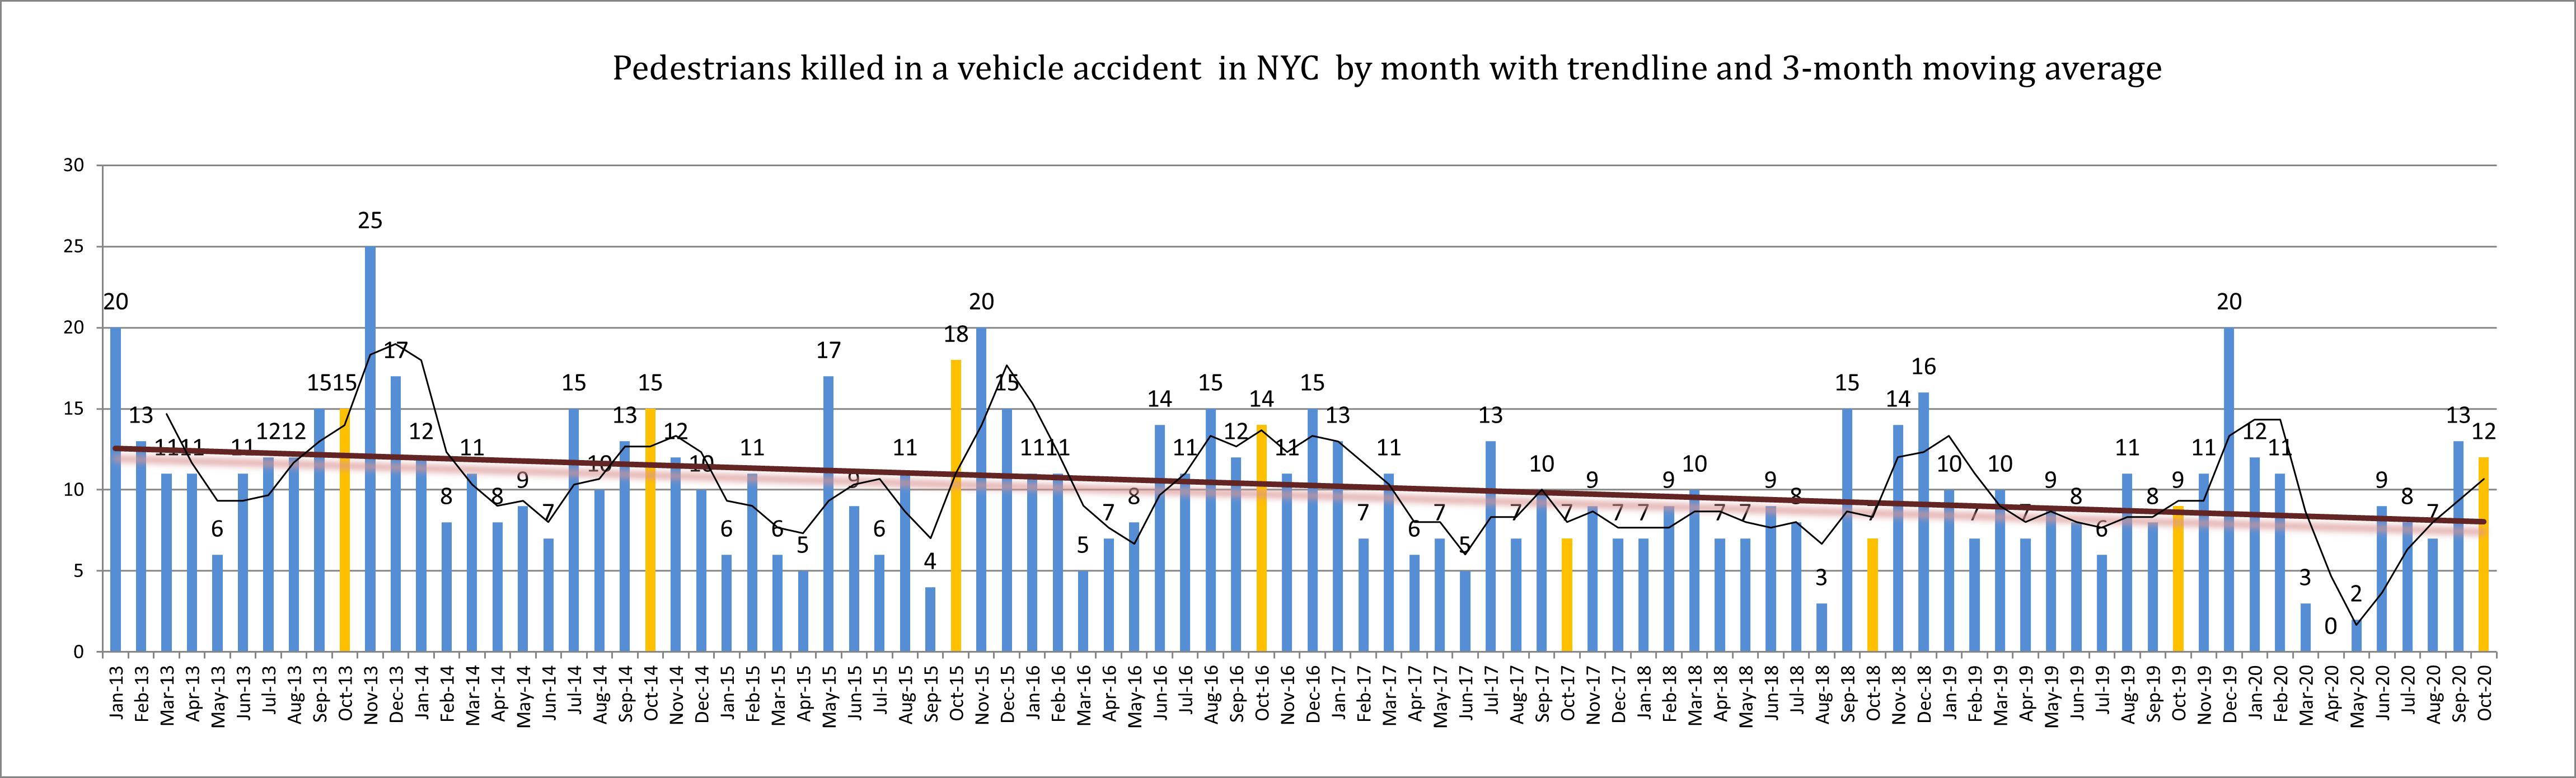 pedestrian accident injuries New York October 2020